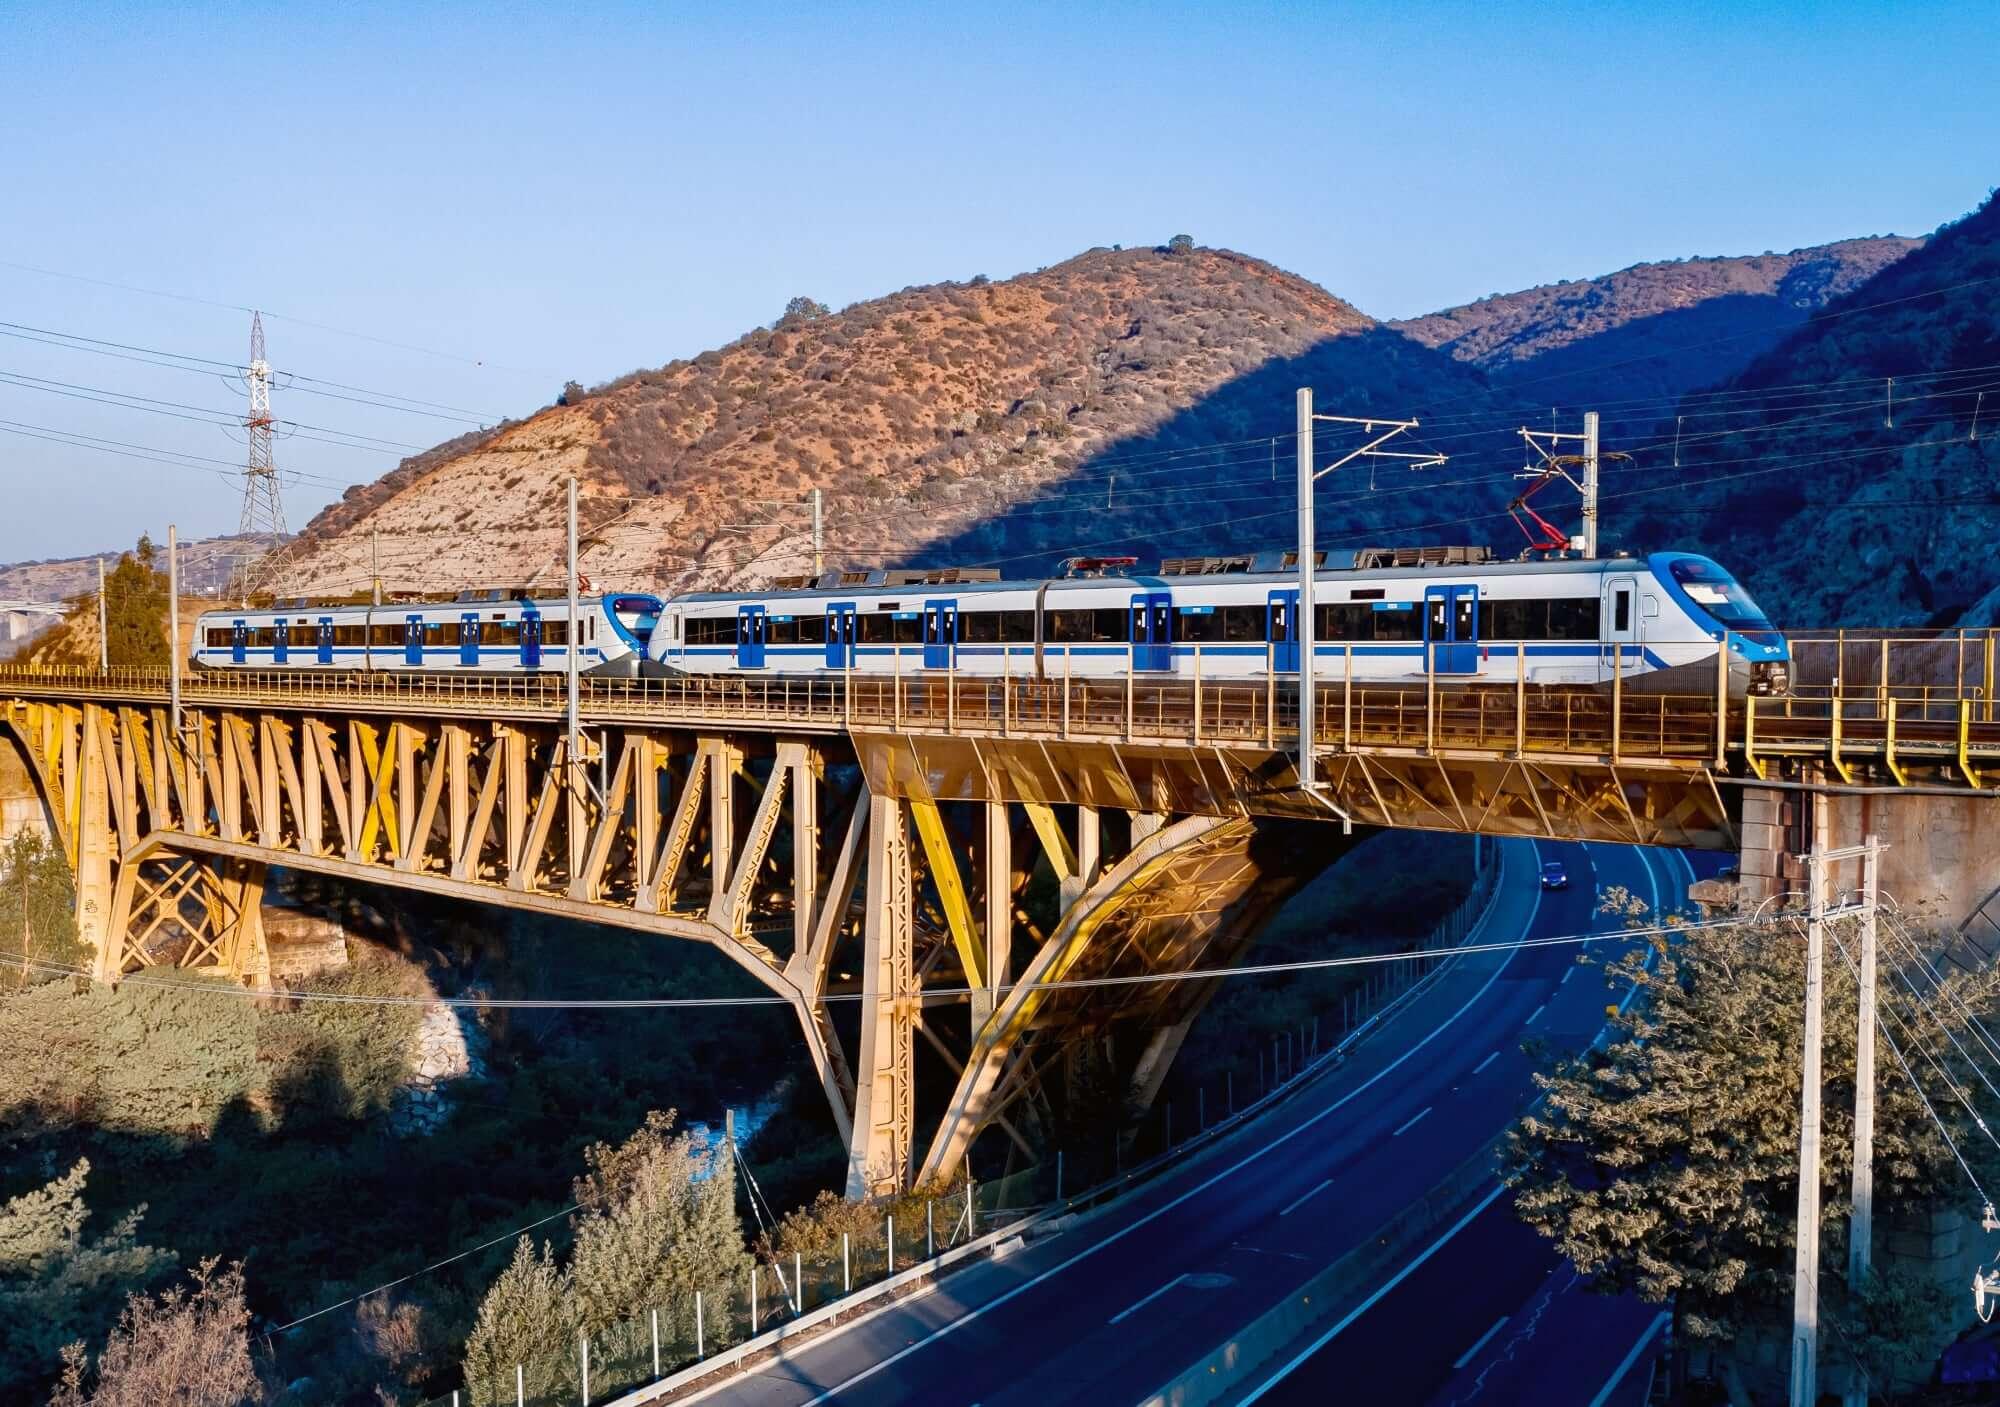 Train Limache - Valparaiso